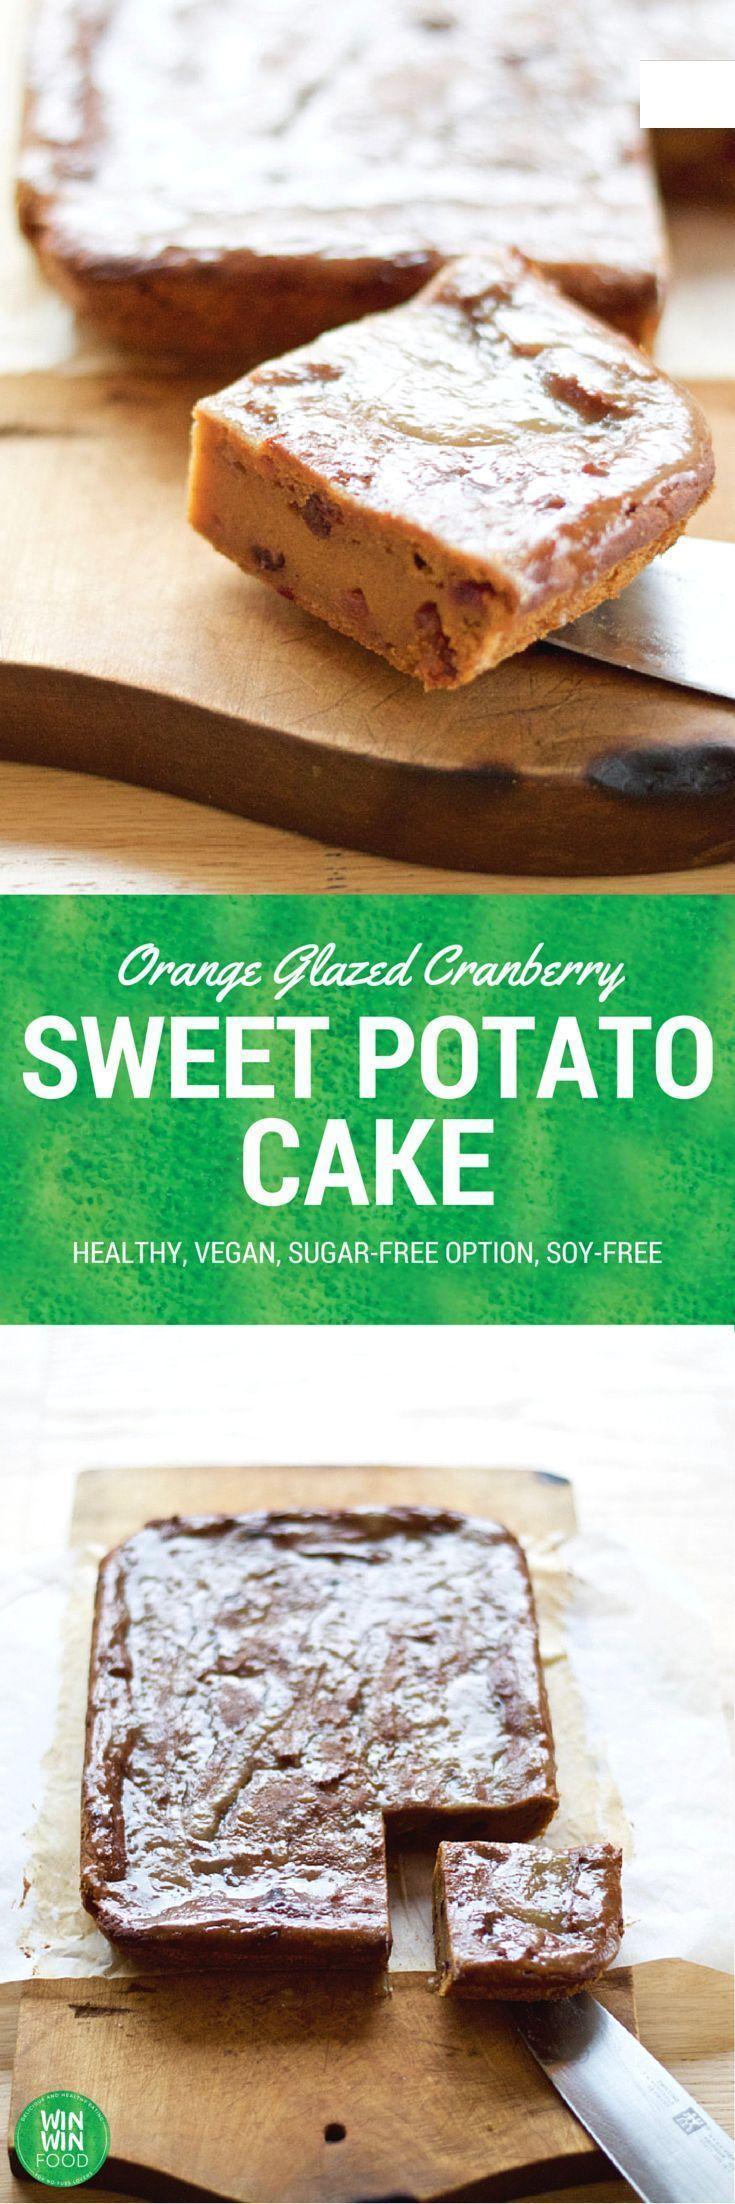 Sweet Potato Cake with Cranberries and Orange Glaze | WIN-WINFOOD.com #healthy #vegan #sugarfree option. Make it #glutenfree too with a GF flour mix